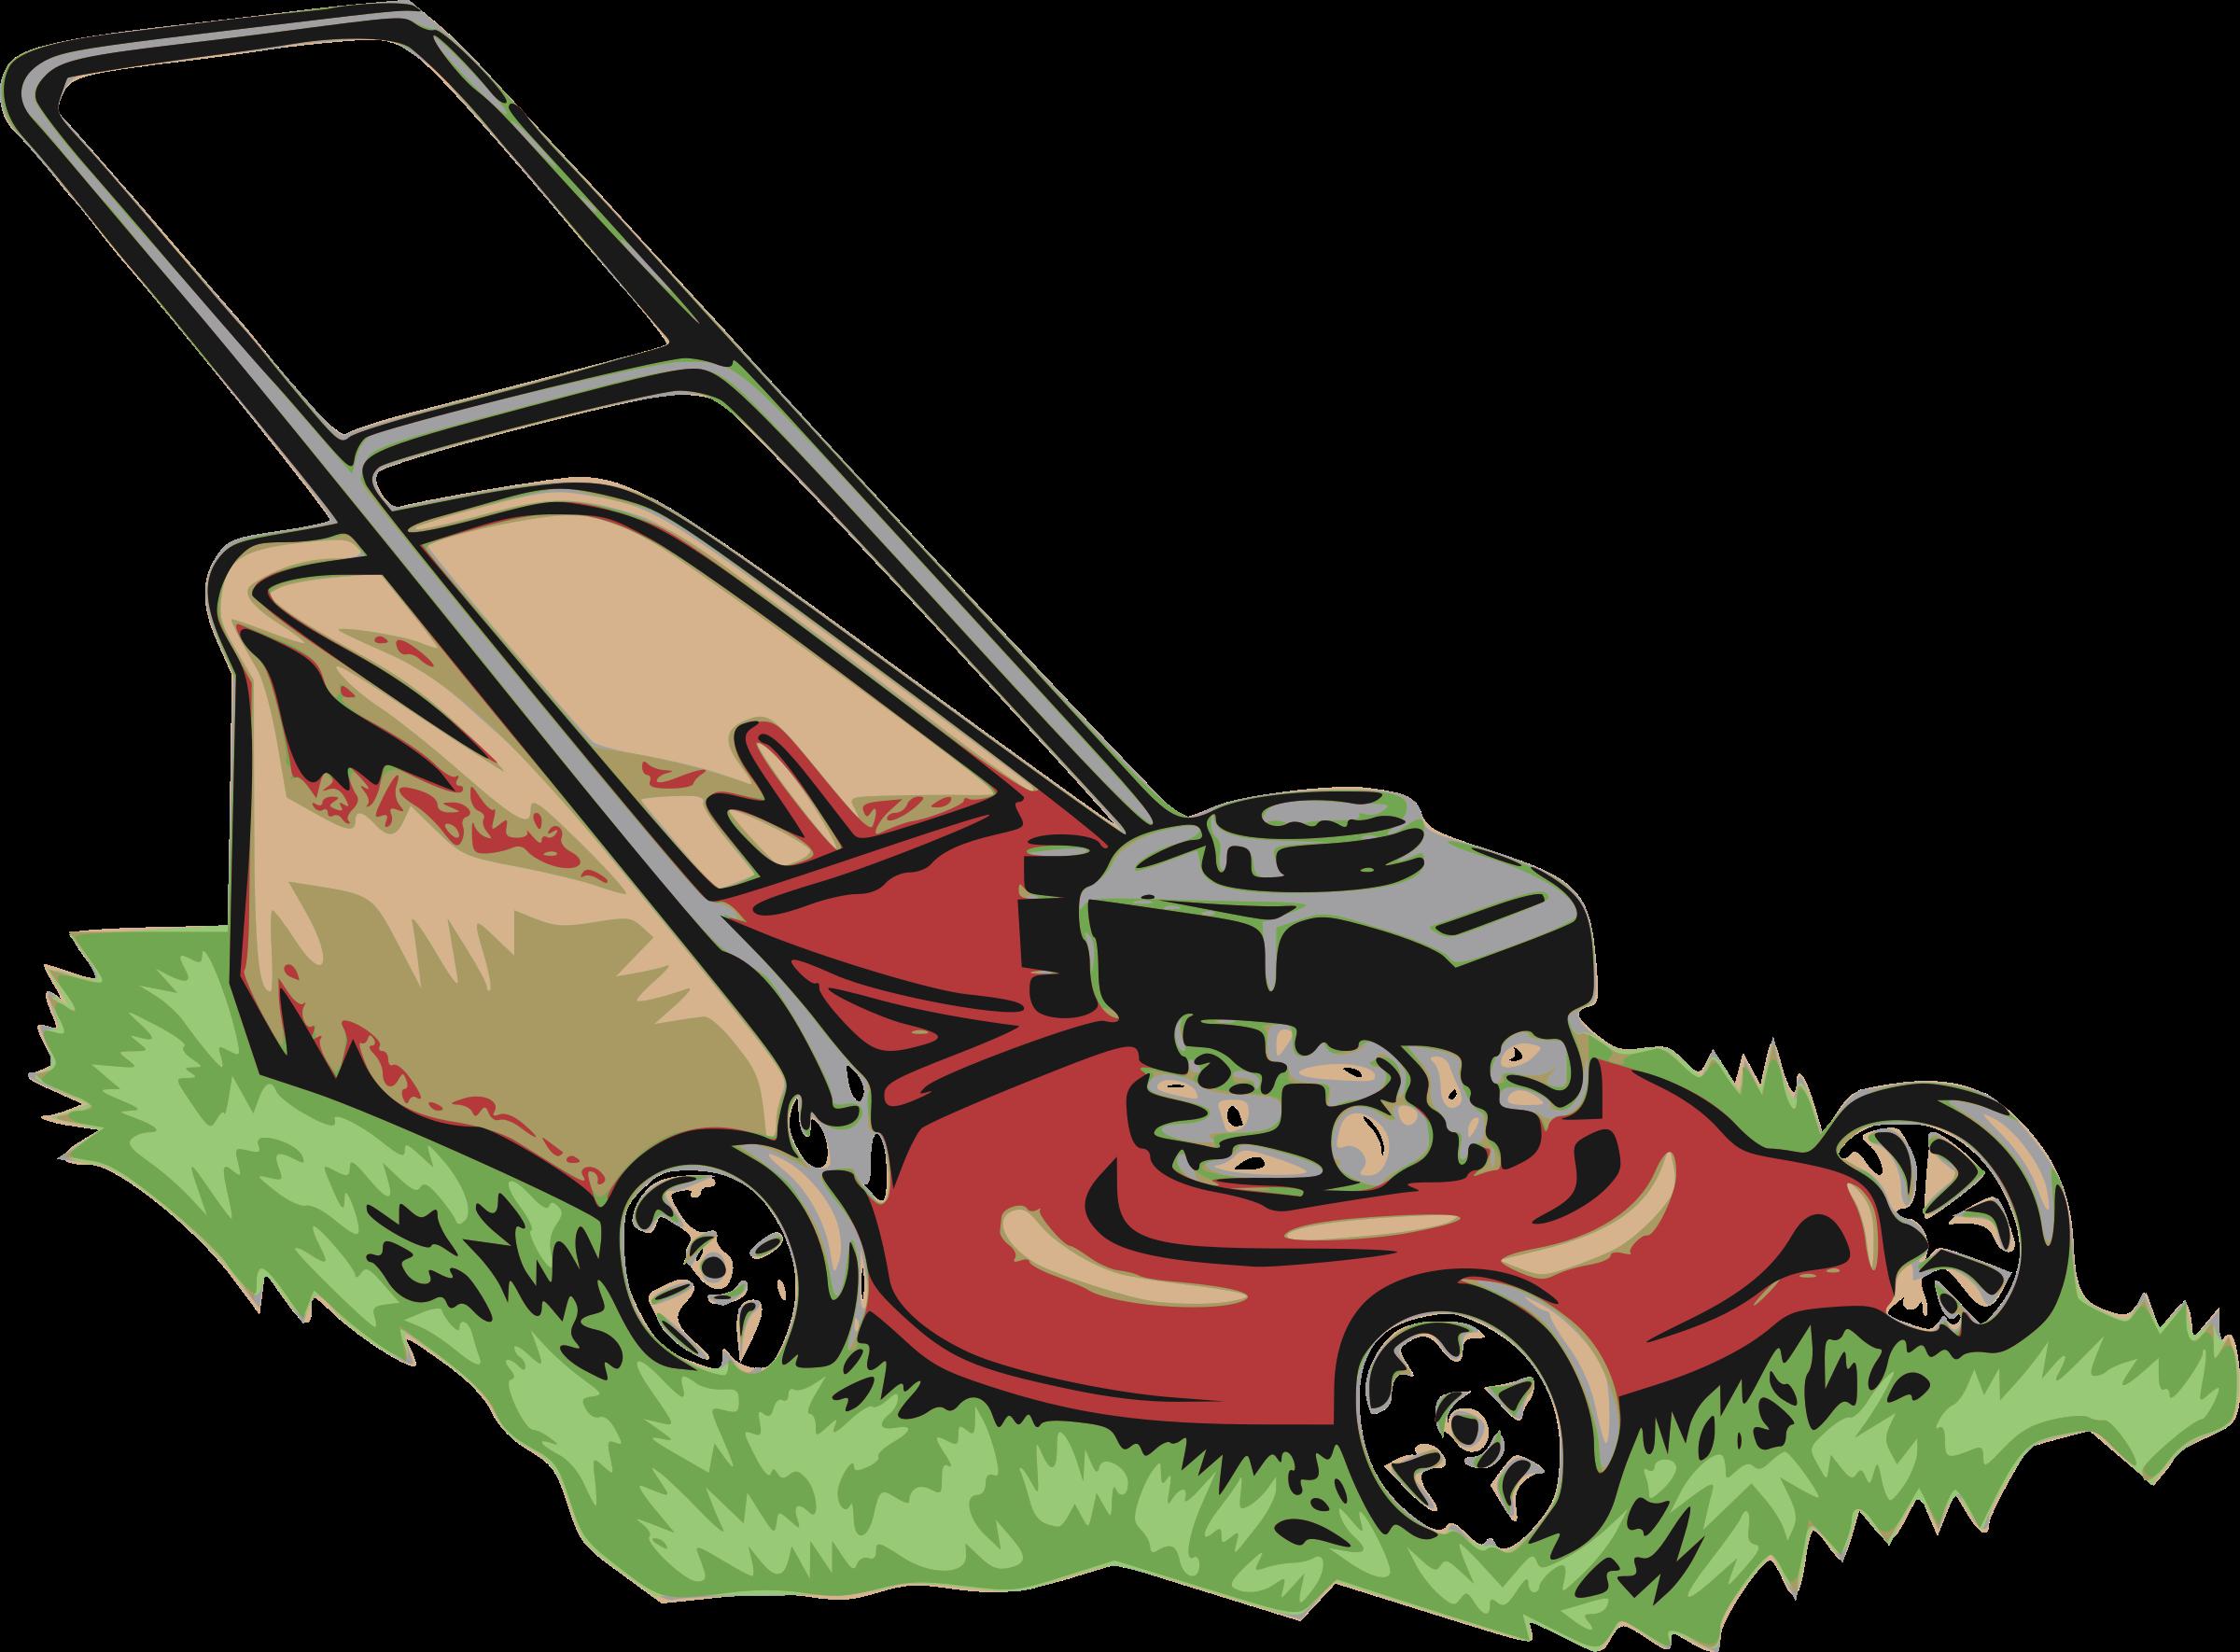 lawn mower clipart clipart suggest lawn mower clipart images lawn mower clip art icon free